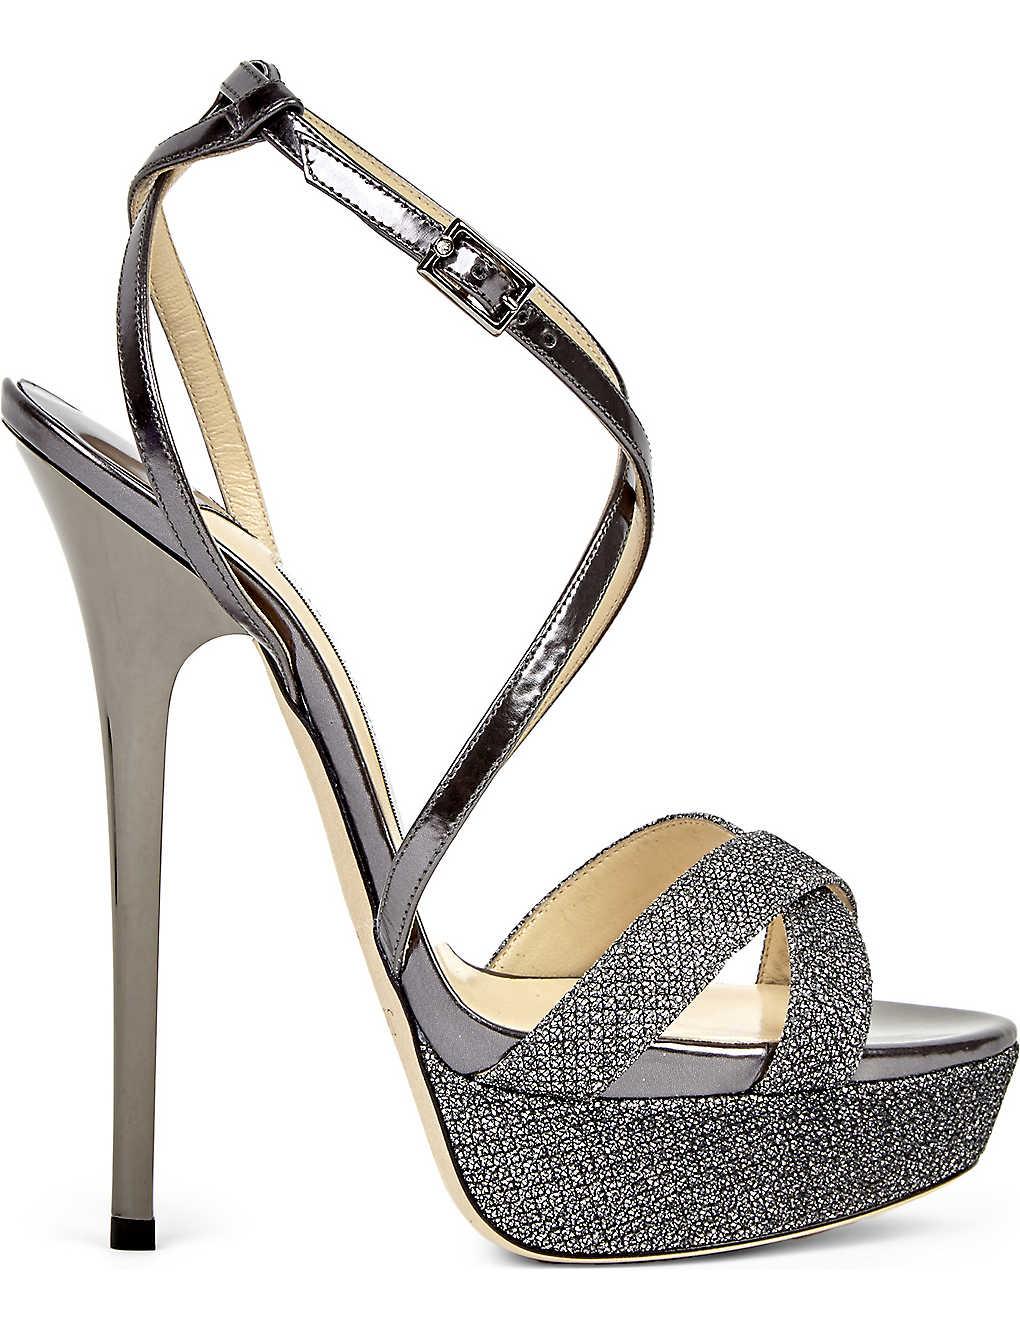 529d9fb54303 JIMMY CHOO - Liddie 145 leather glitter platform sandals ...